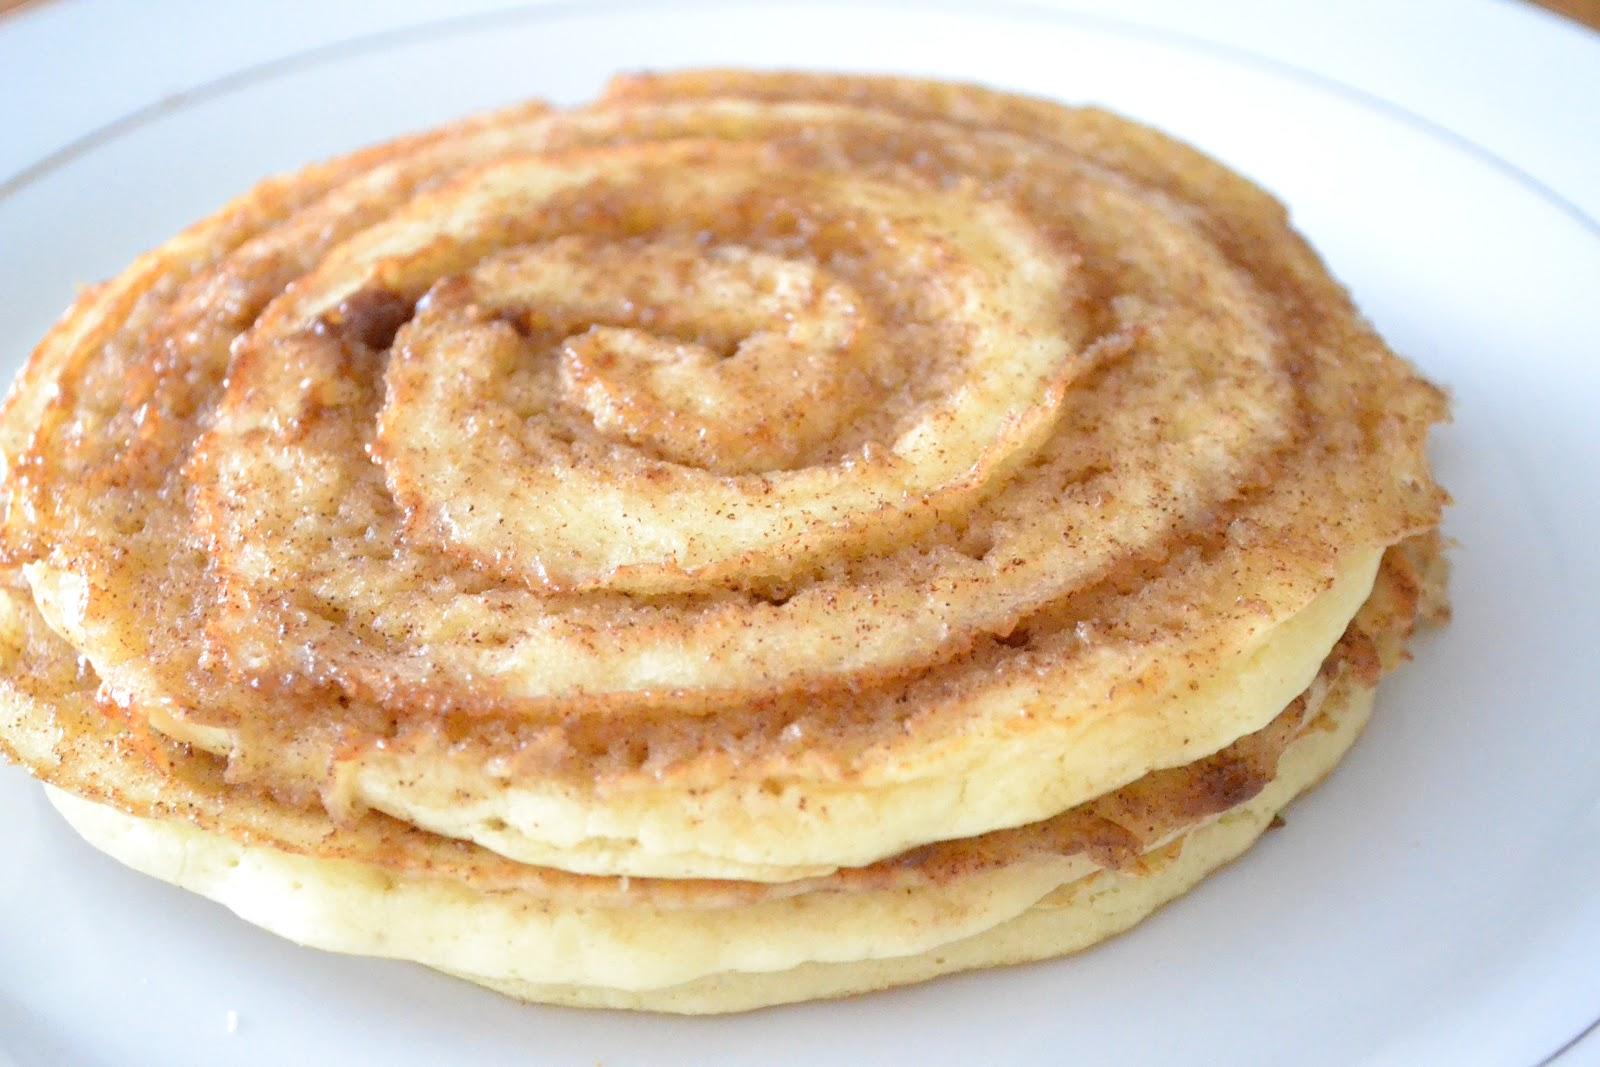 ... serve, spoon warmed cream cheese glaze on top of each pancake. Enjoy